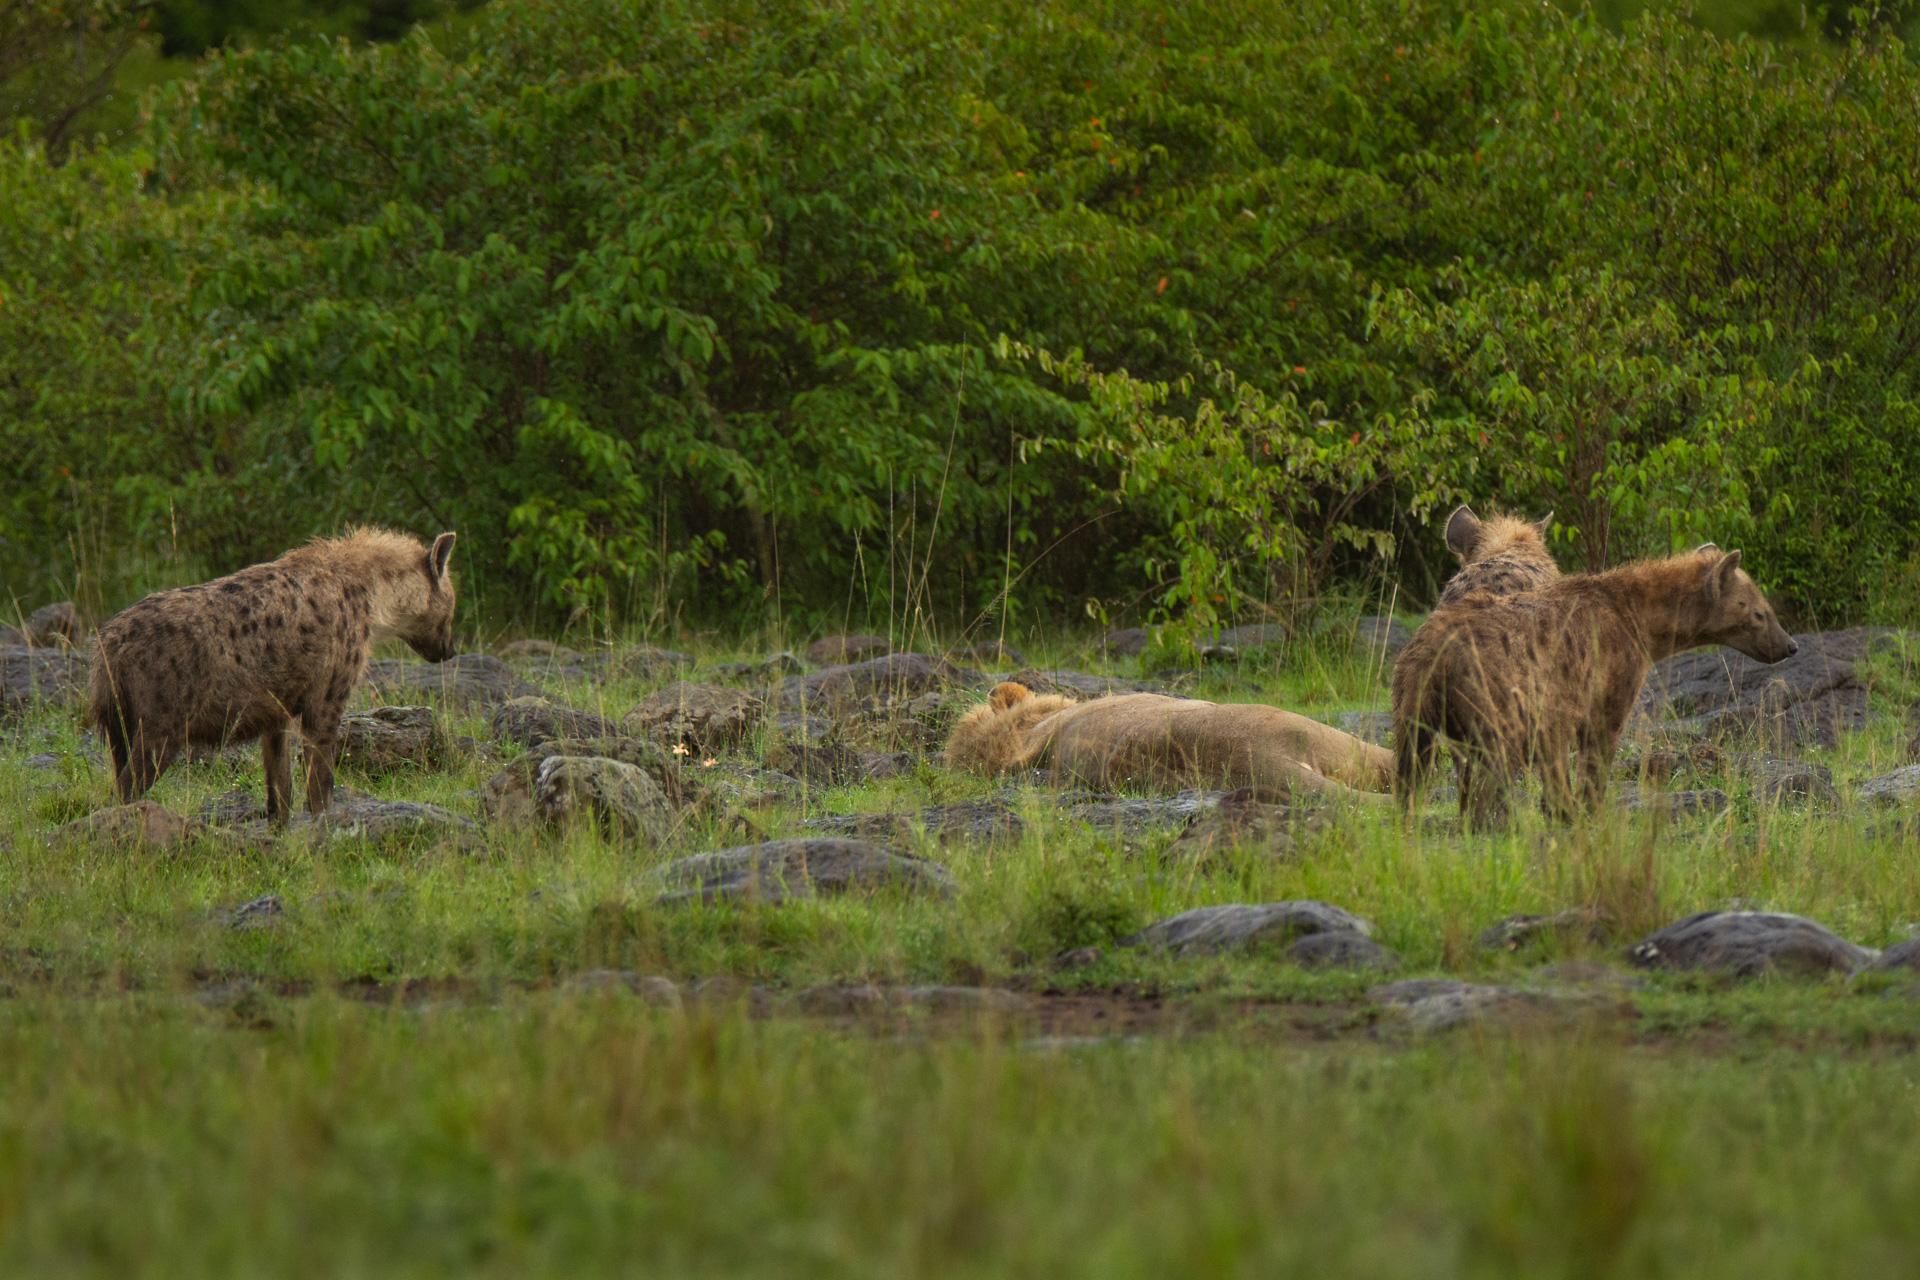 Hyena and lion